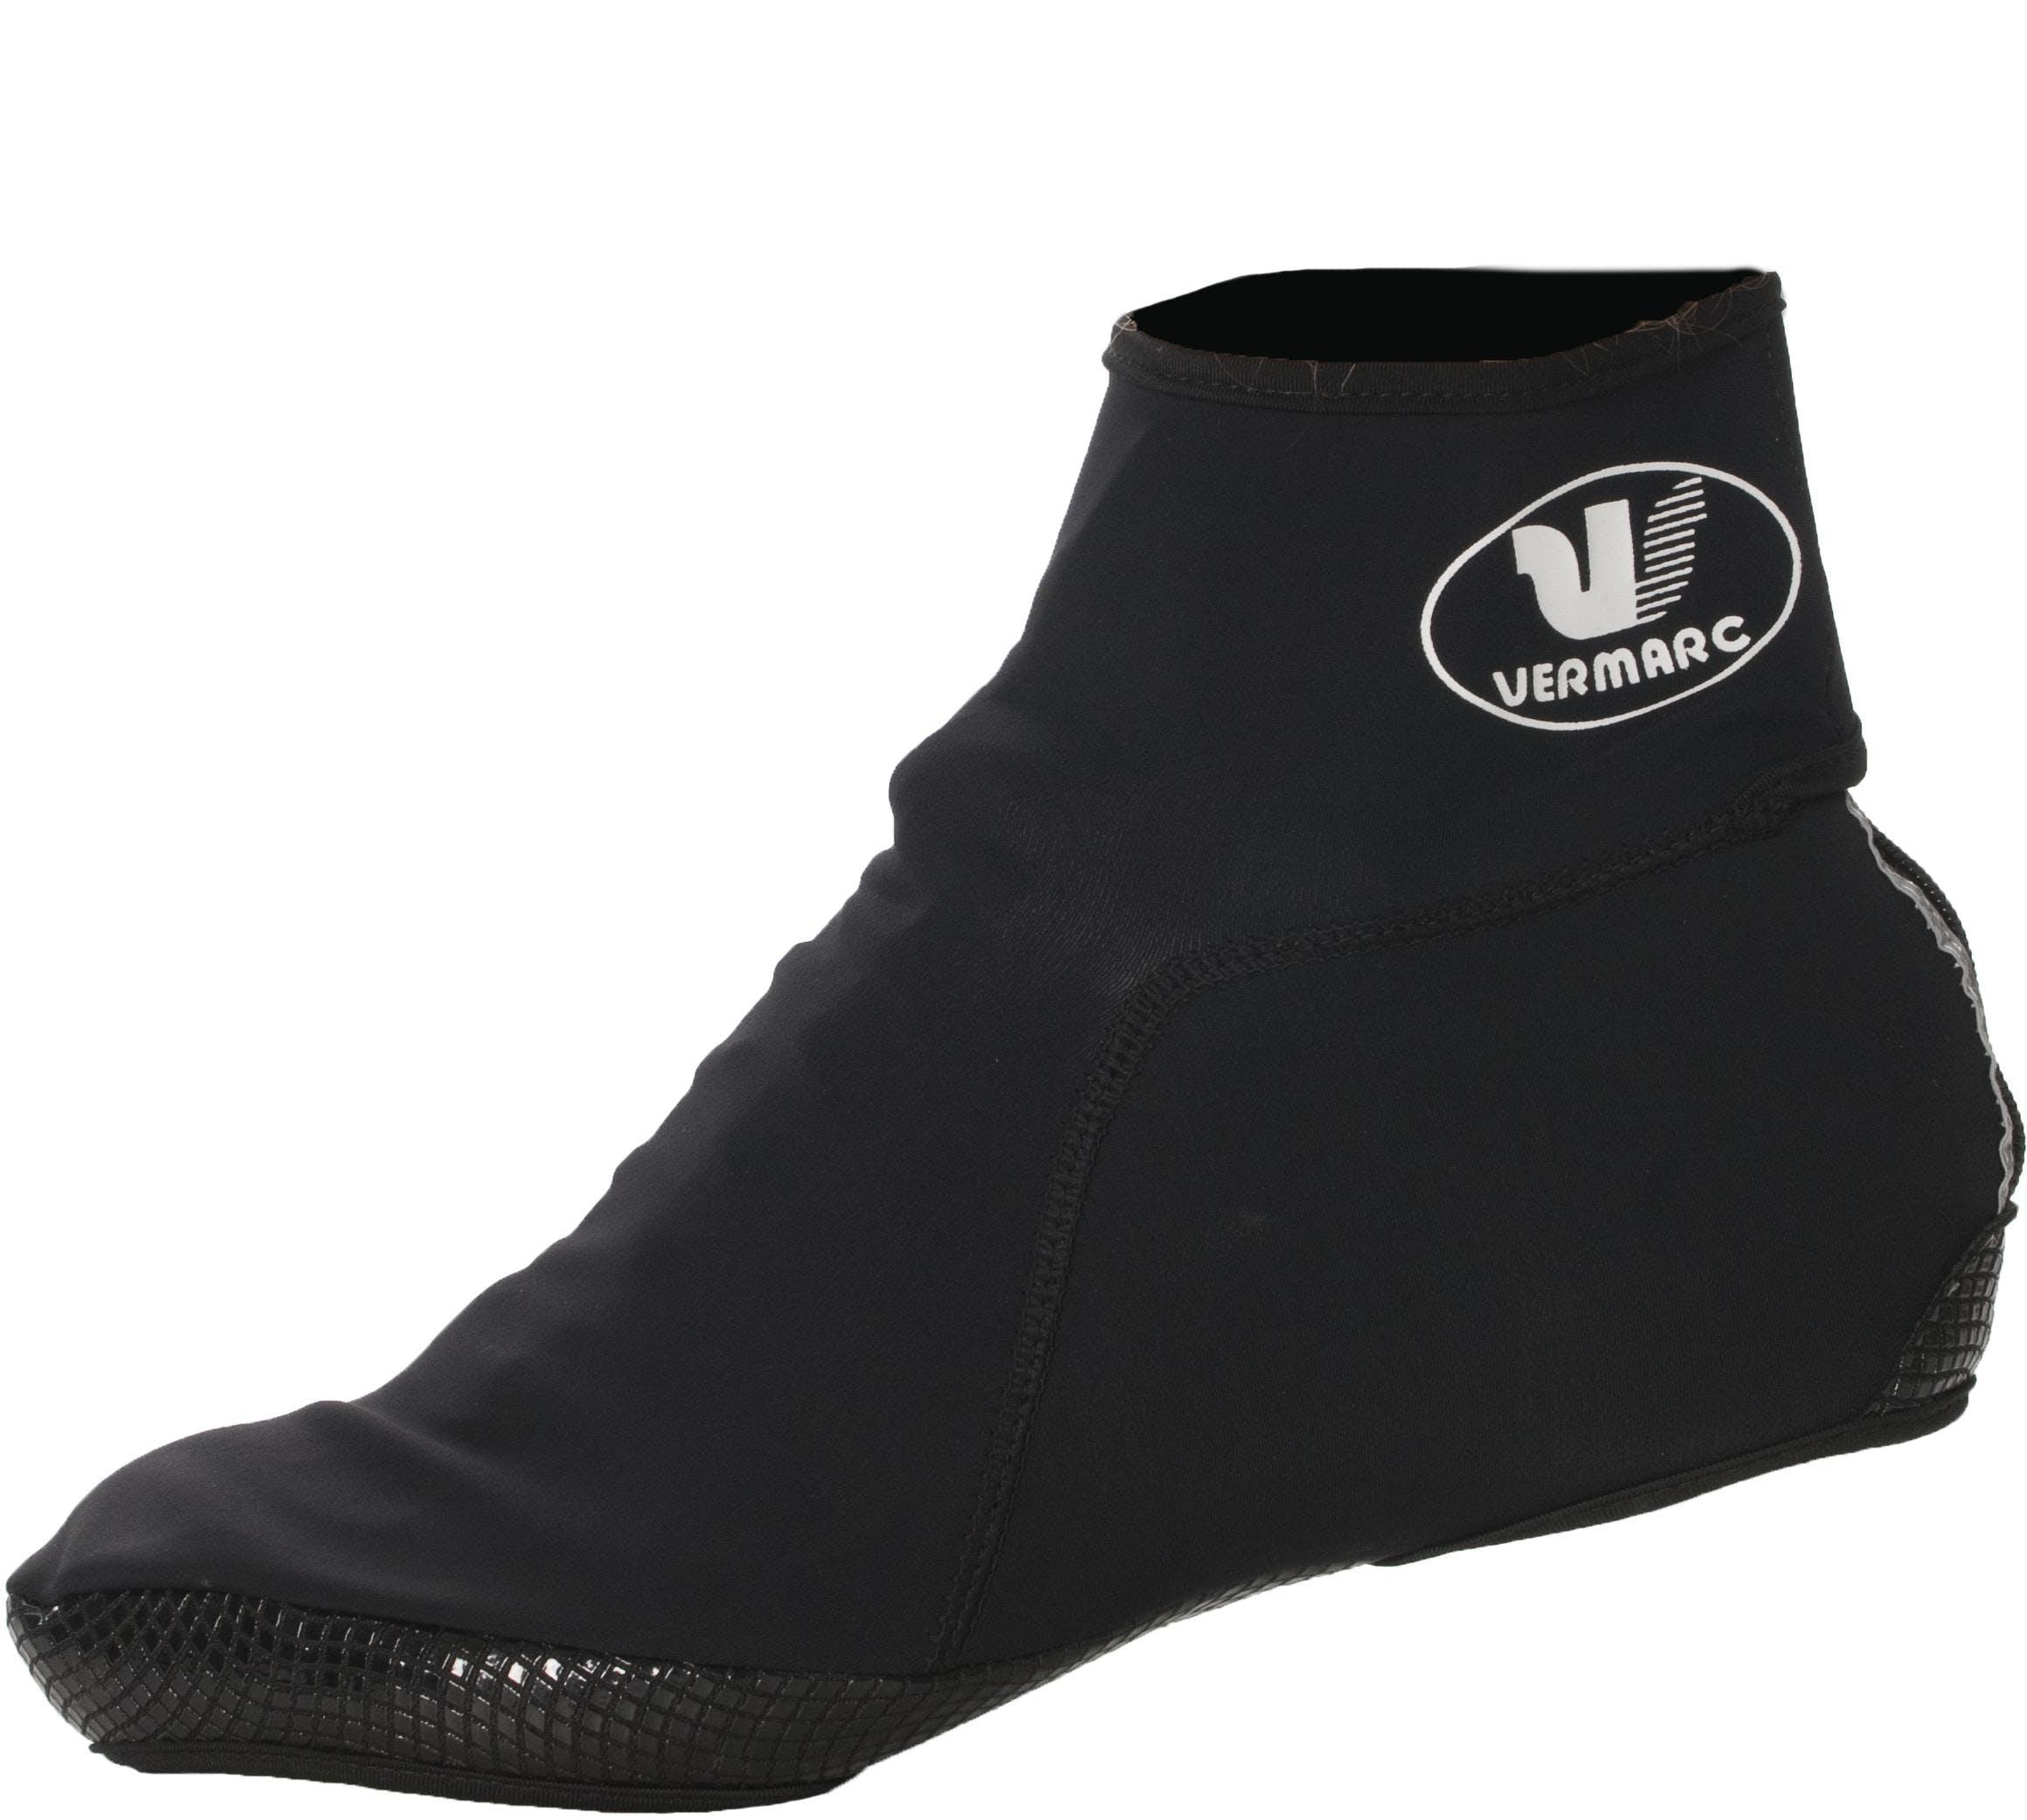 Couvre-Chaussure Aqua Roubaix